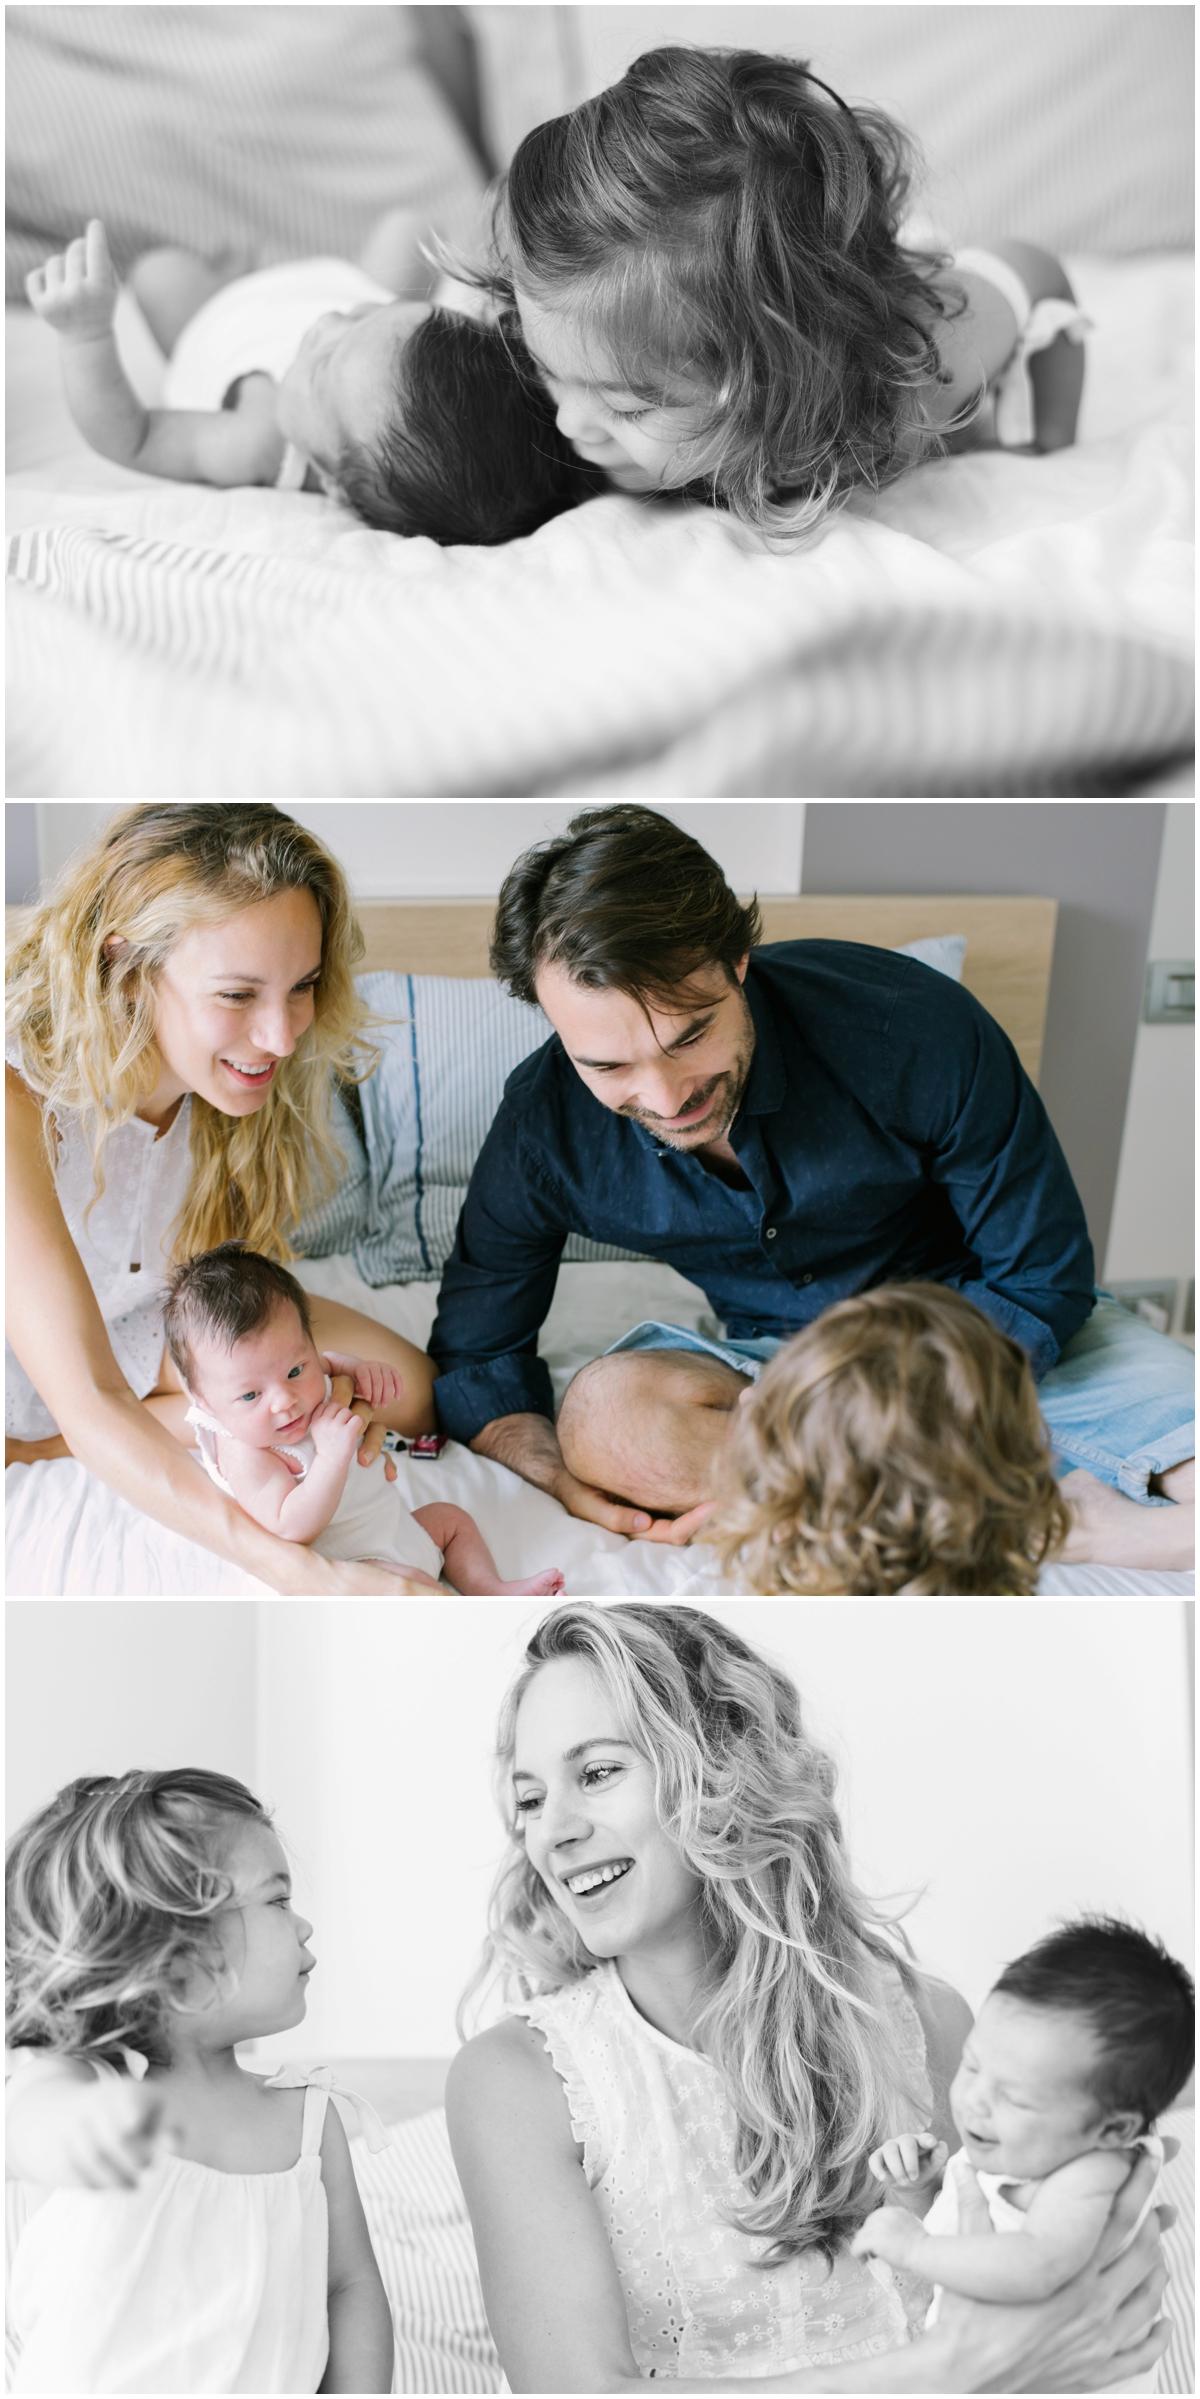 Alea+Lovely+Family+Portraits_0015-1.jpg